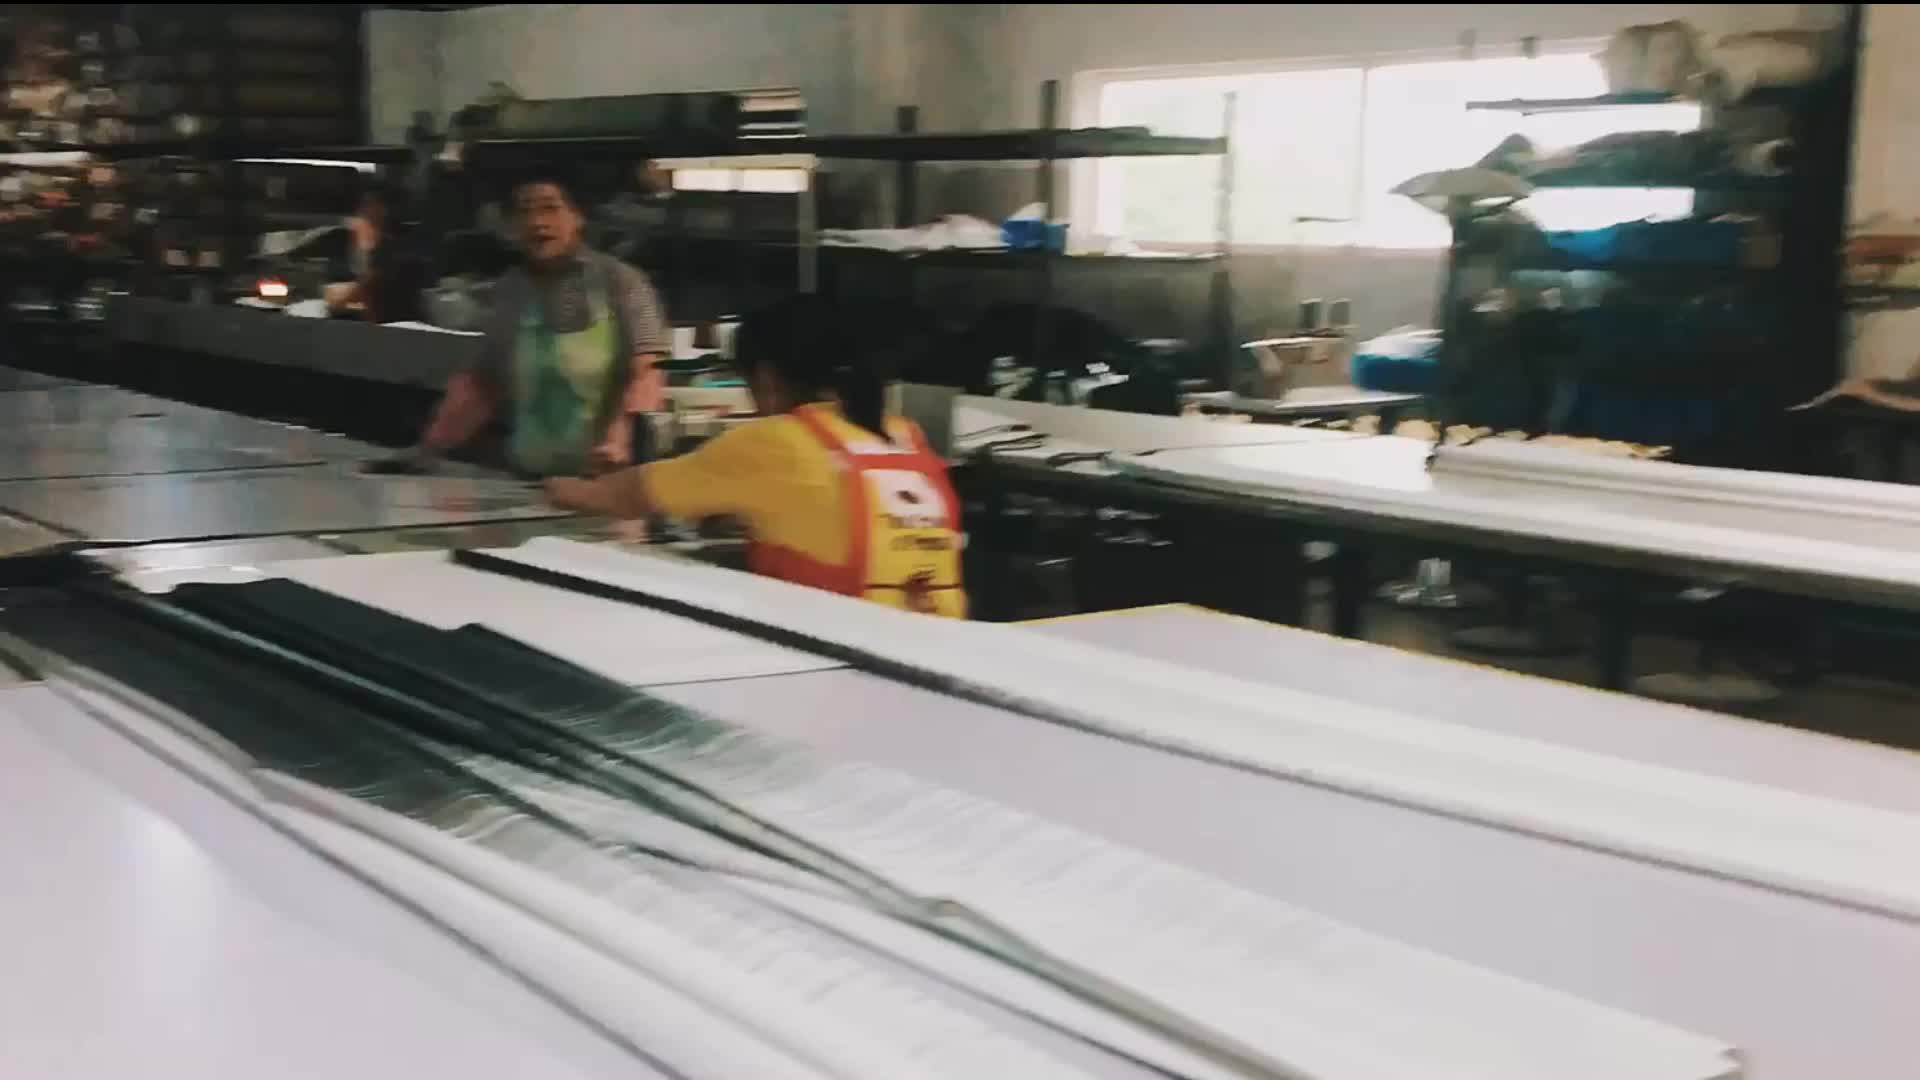 16x8 FT PVC VInyl Fabric for Caravan Awnings Replacement